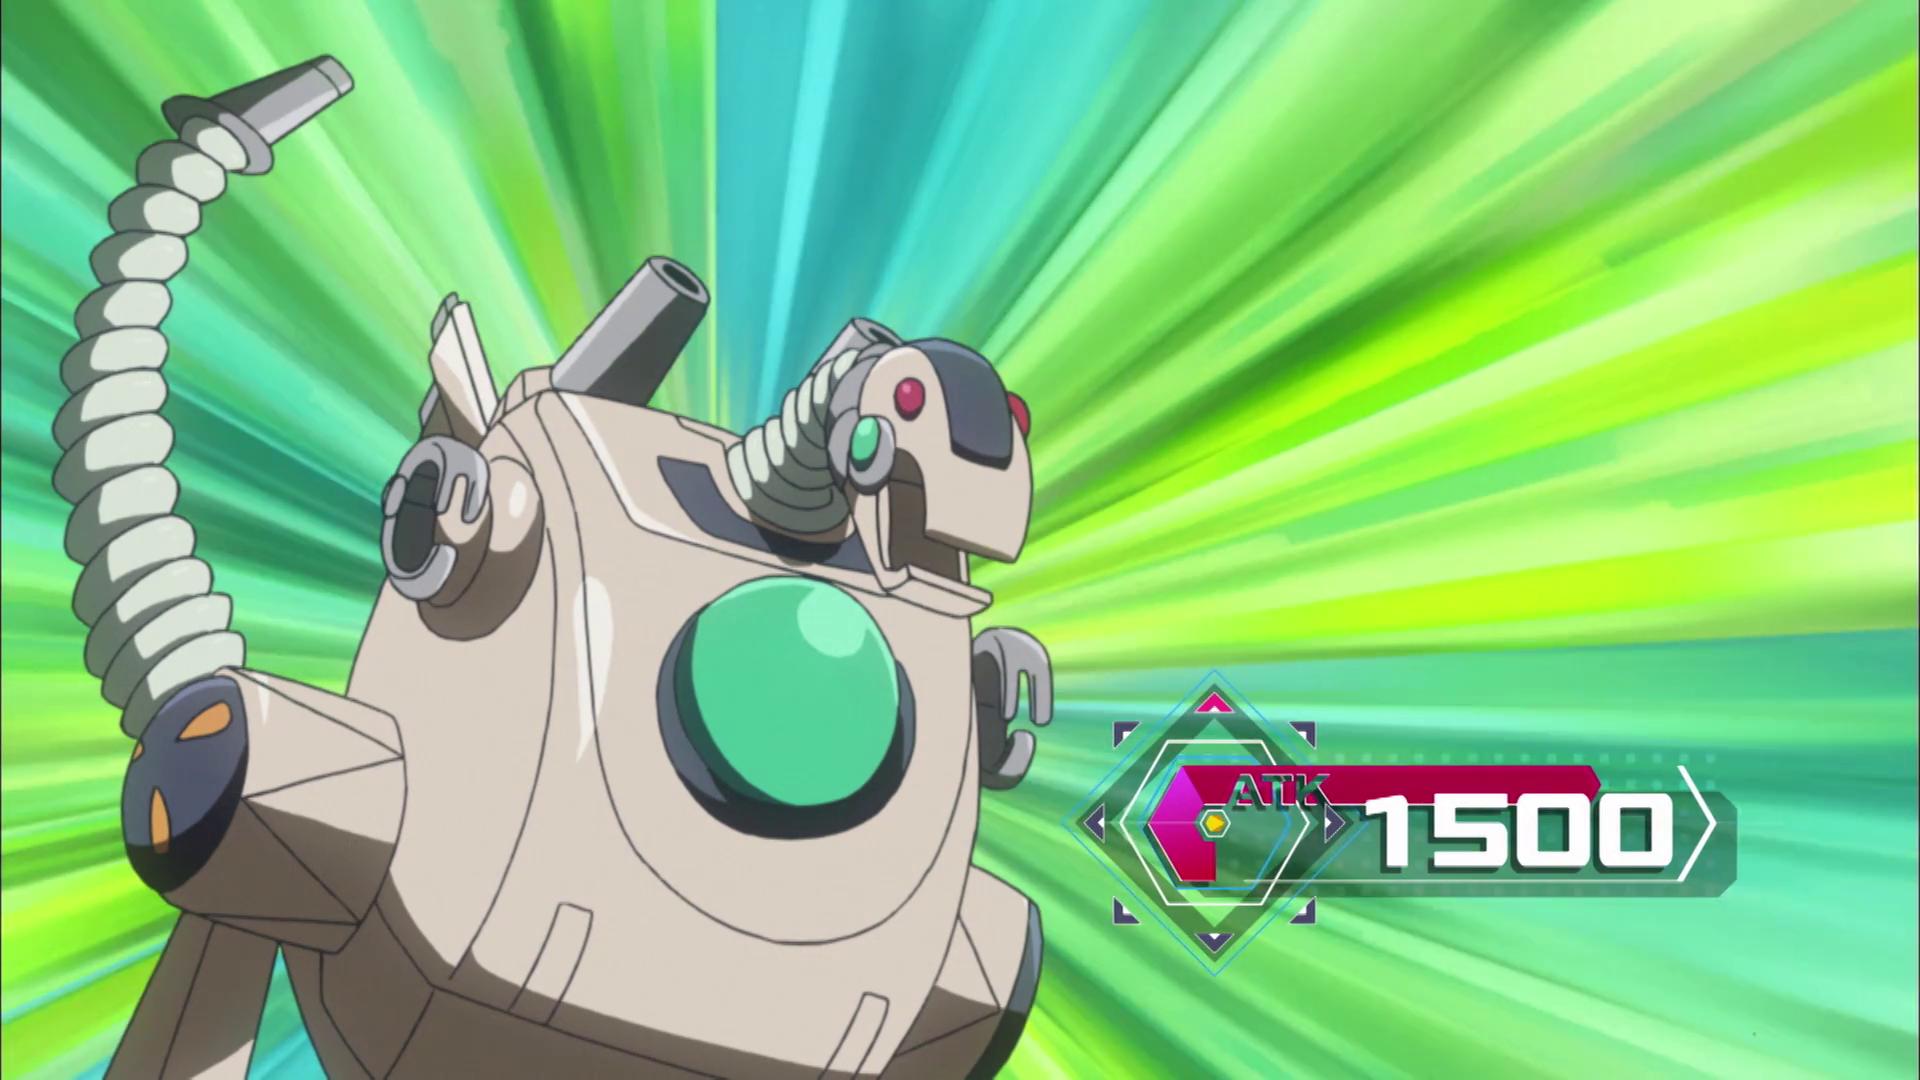 Appliancer Laundry Dragon (anime)